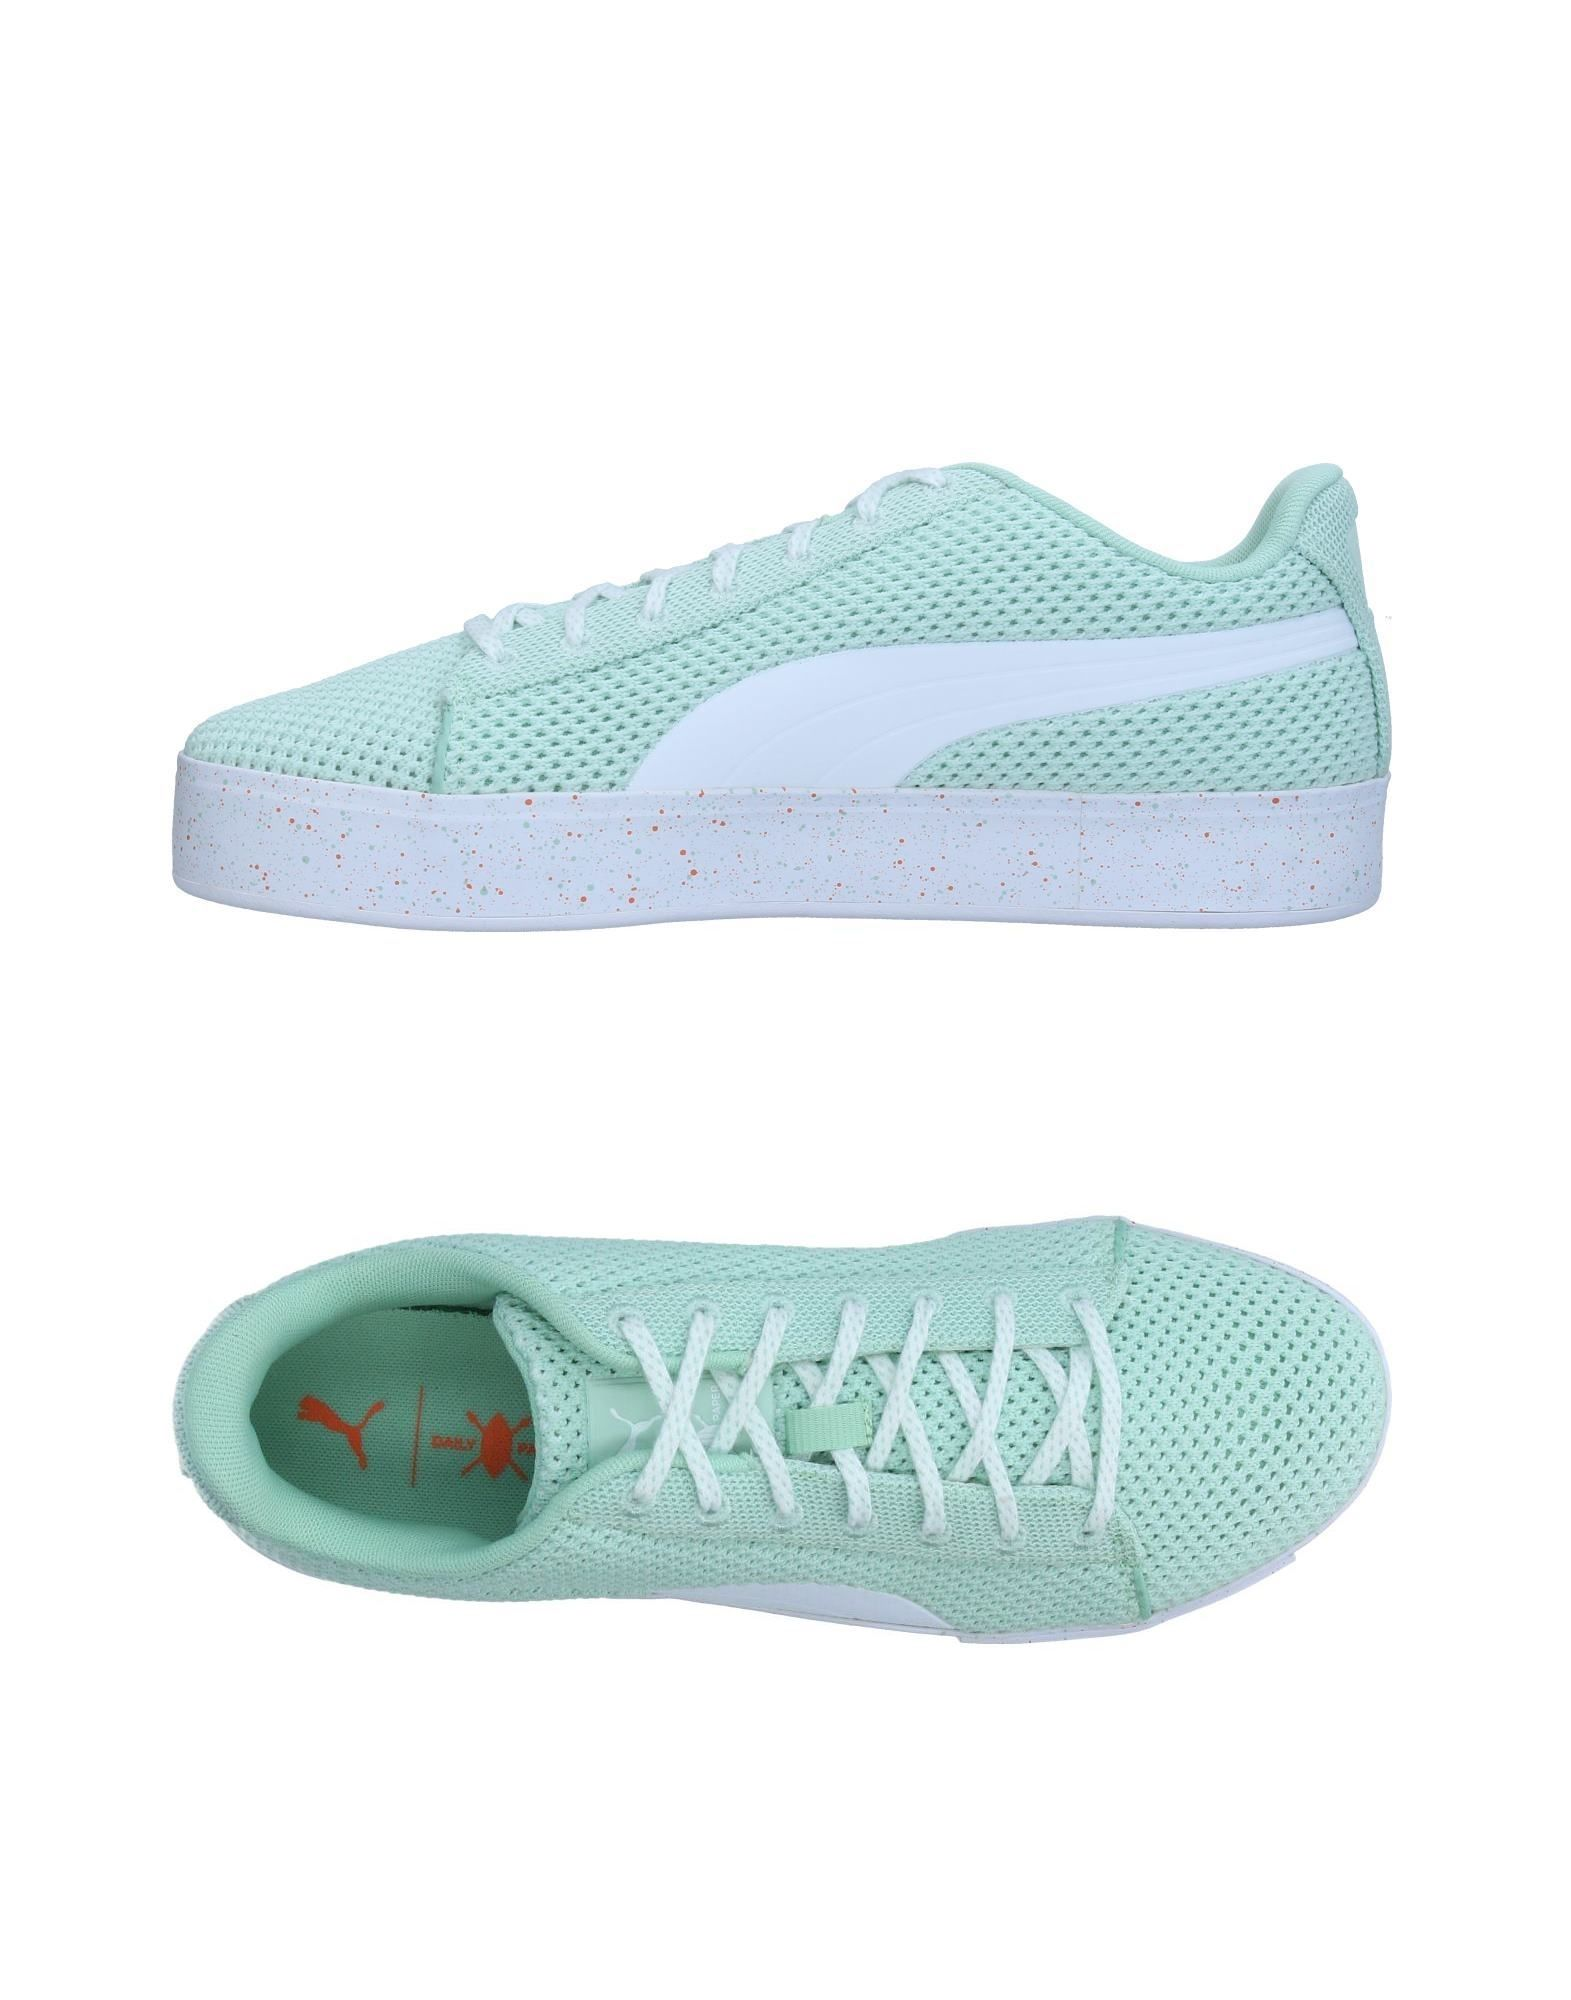 Sneakers Puma X Daily Paper Uomo - 11326586TR